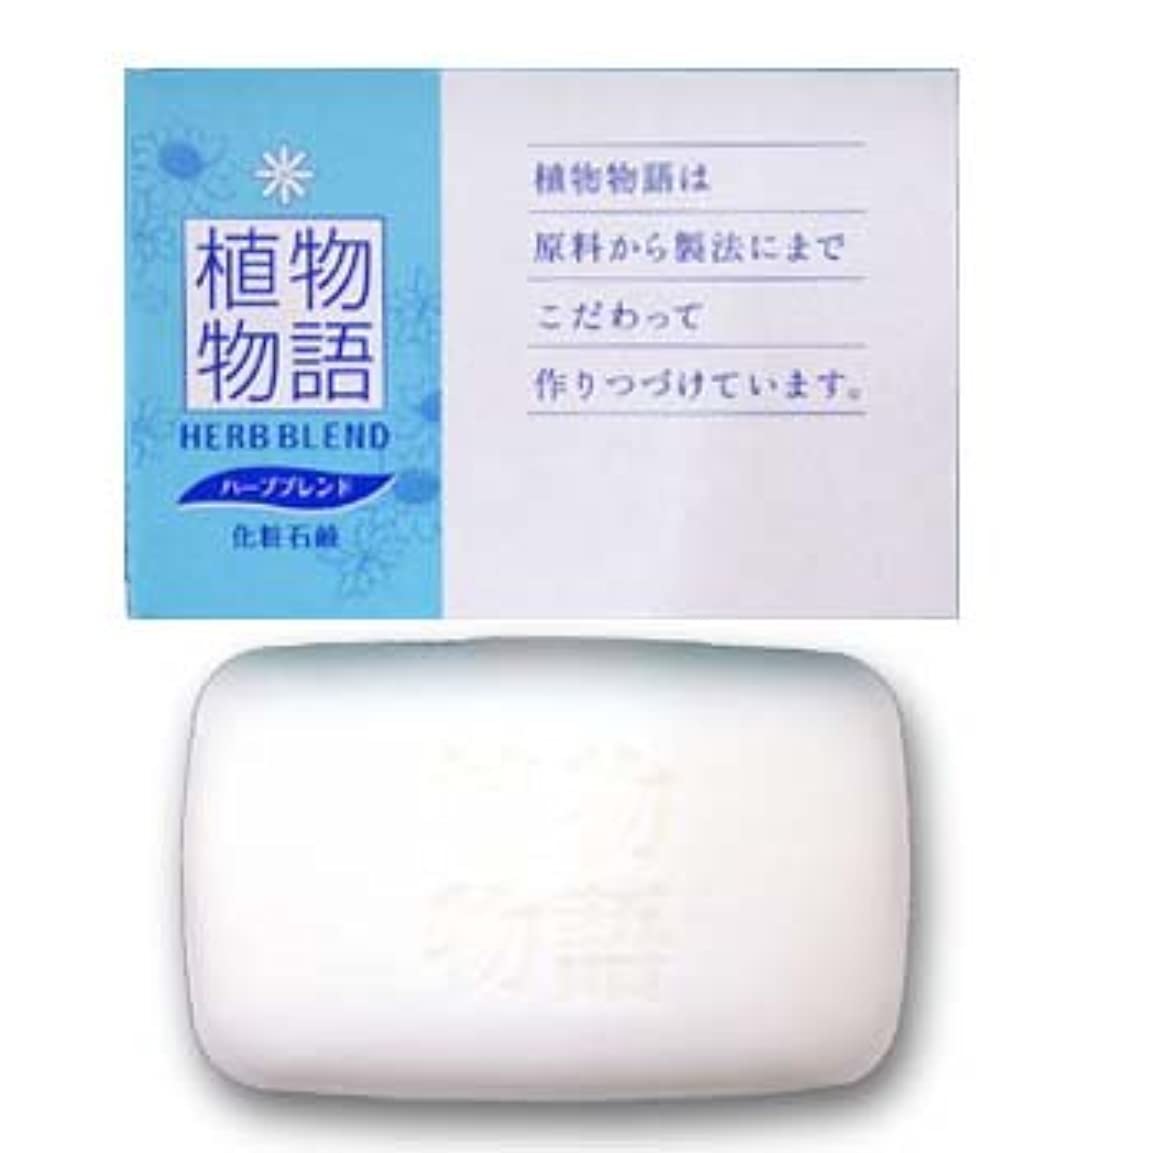 ソーダ水後方順応性LION 植物物語石鹸80g化粧箱入(1セット100個入)